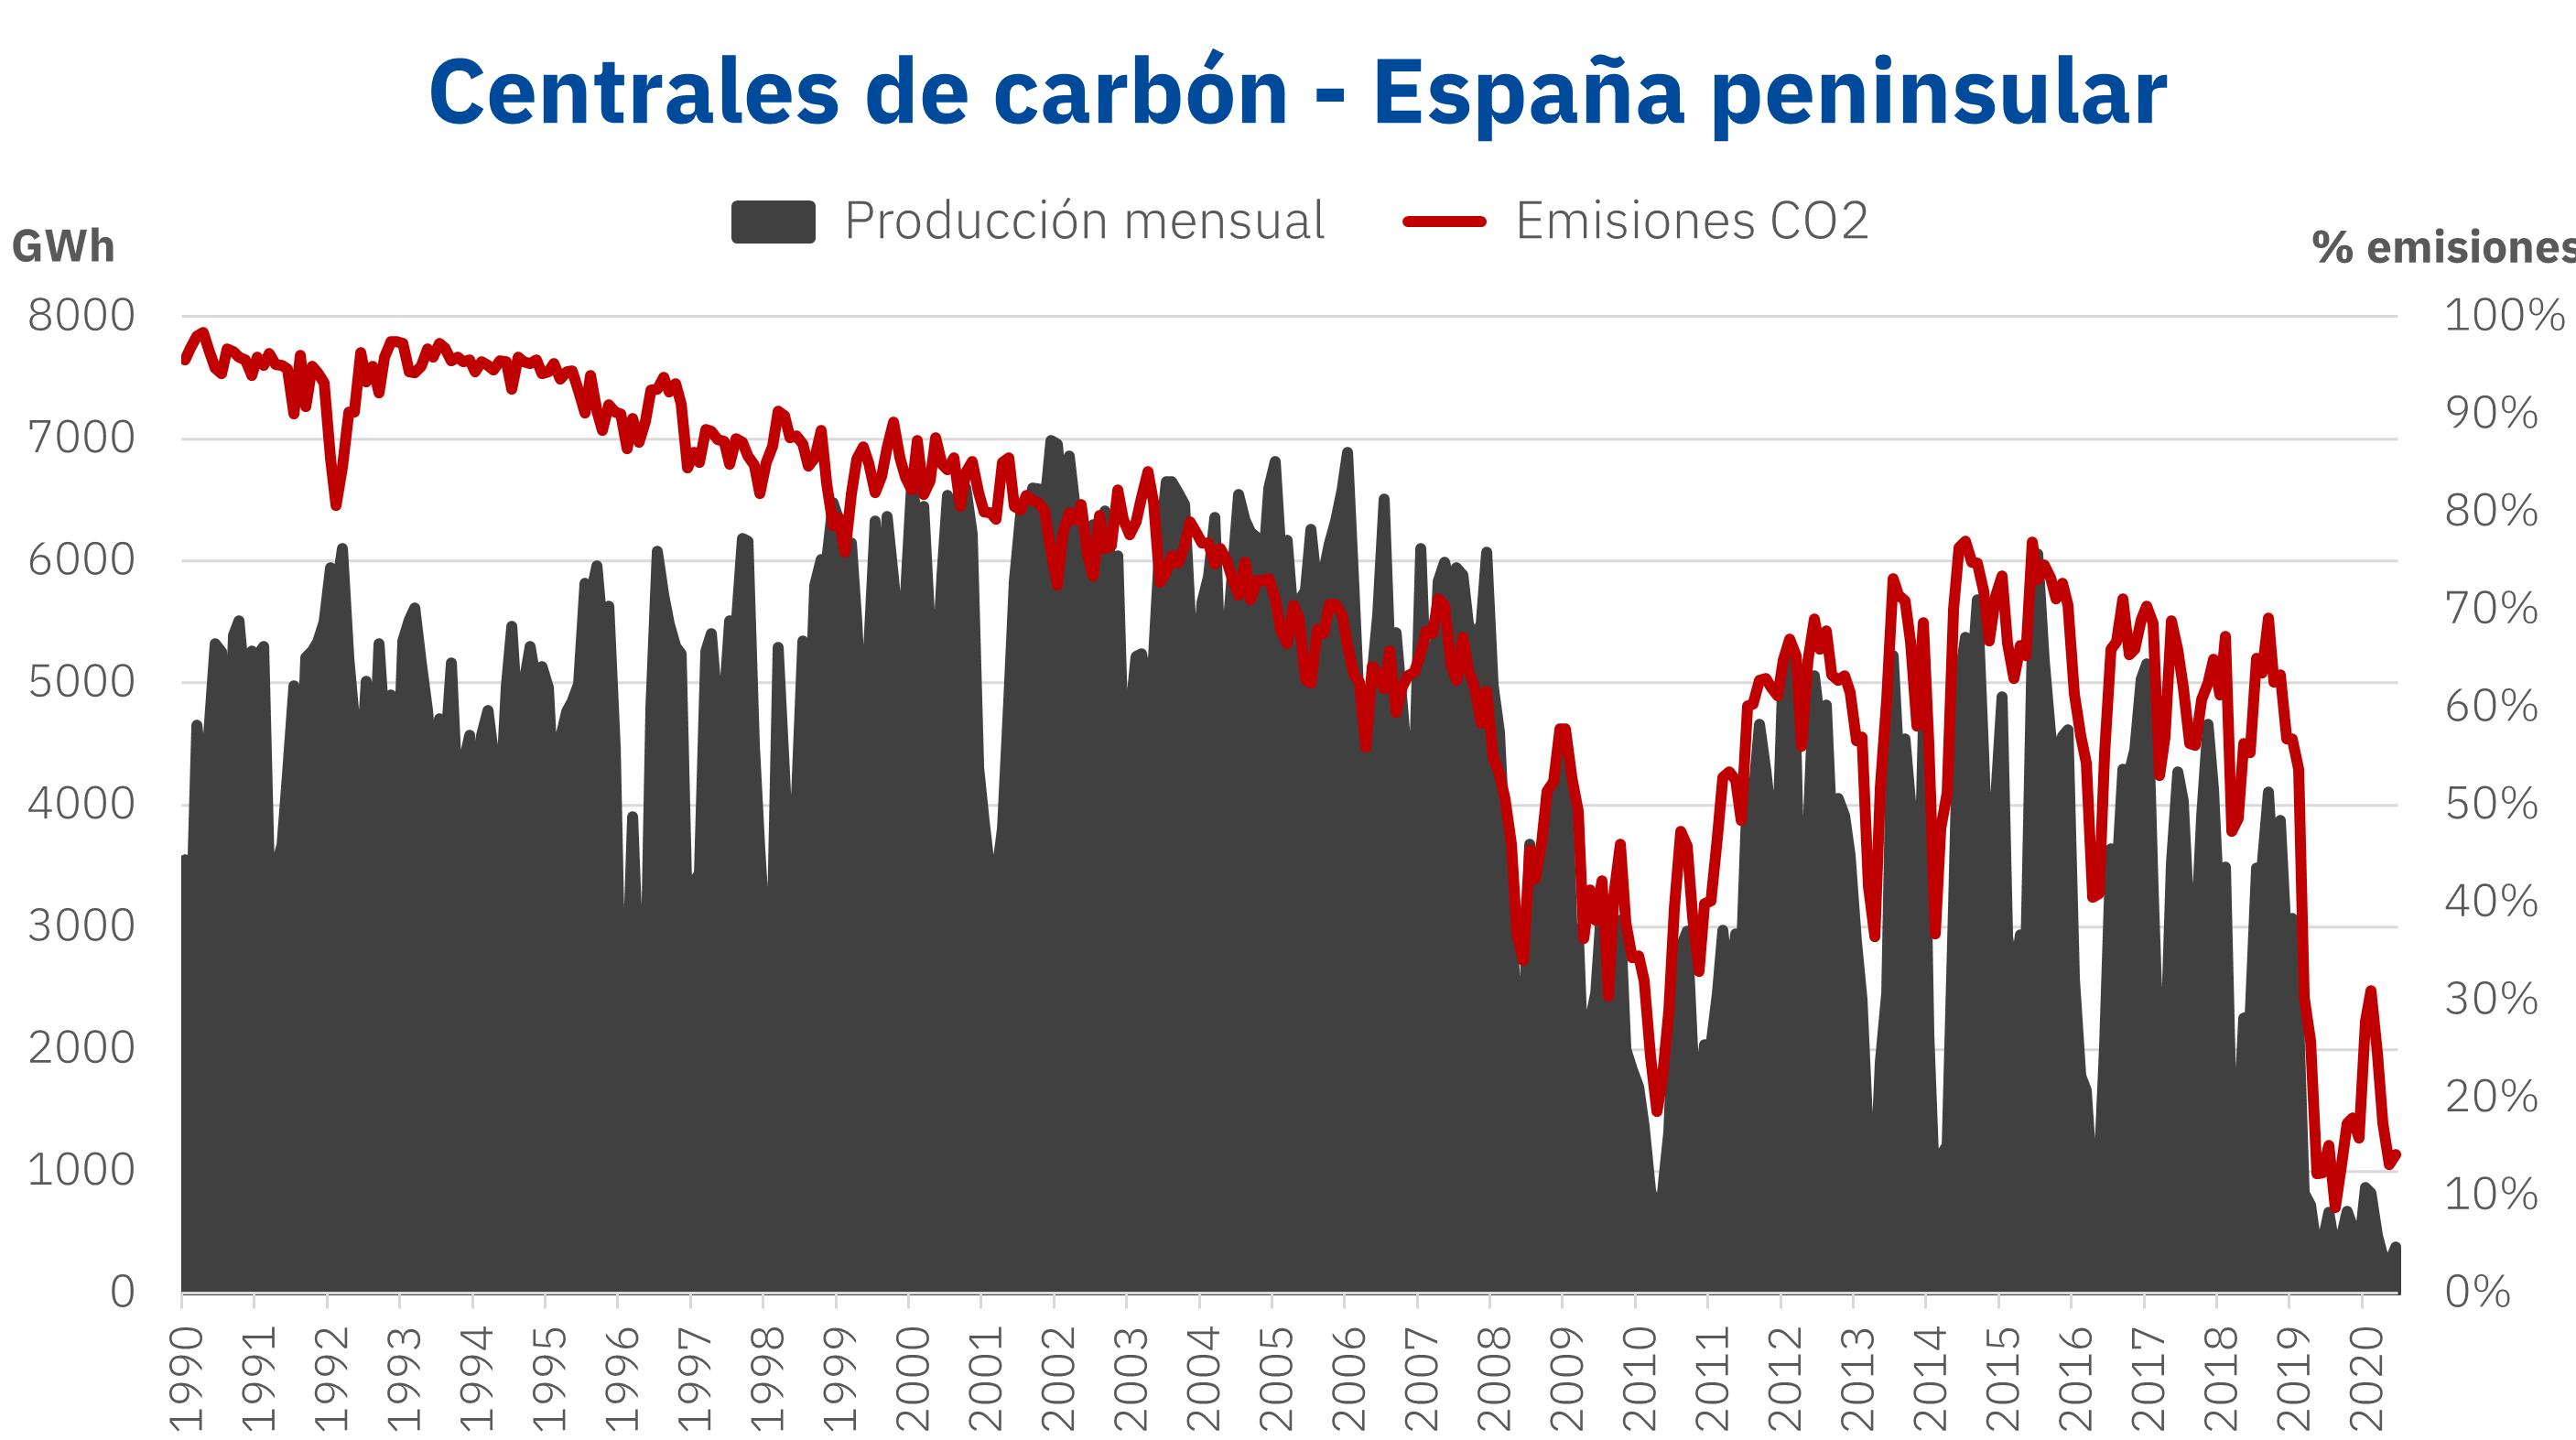 AleaSoft - Carbon produccion emisones CO2 Espana